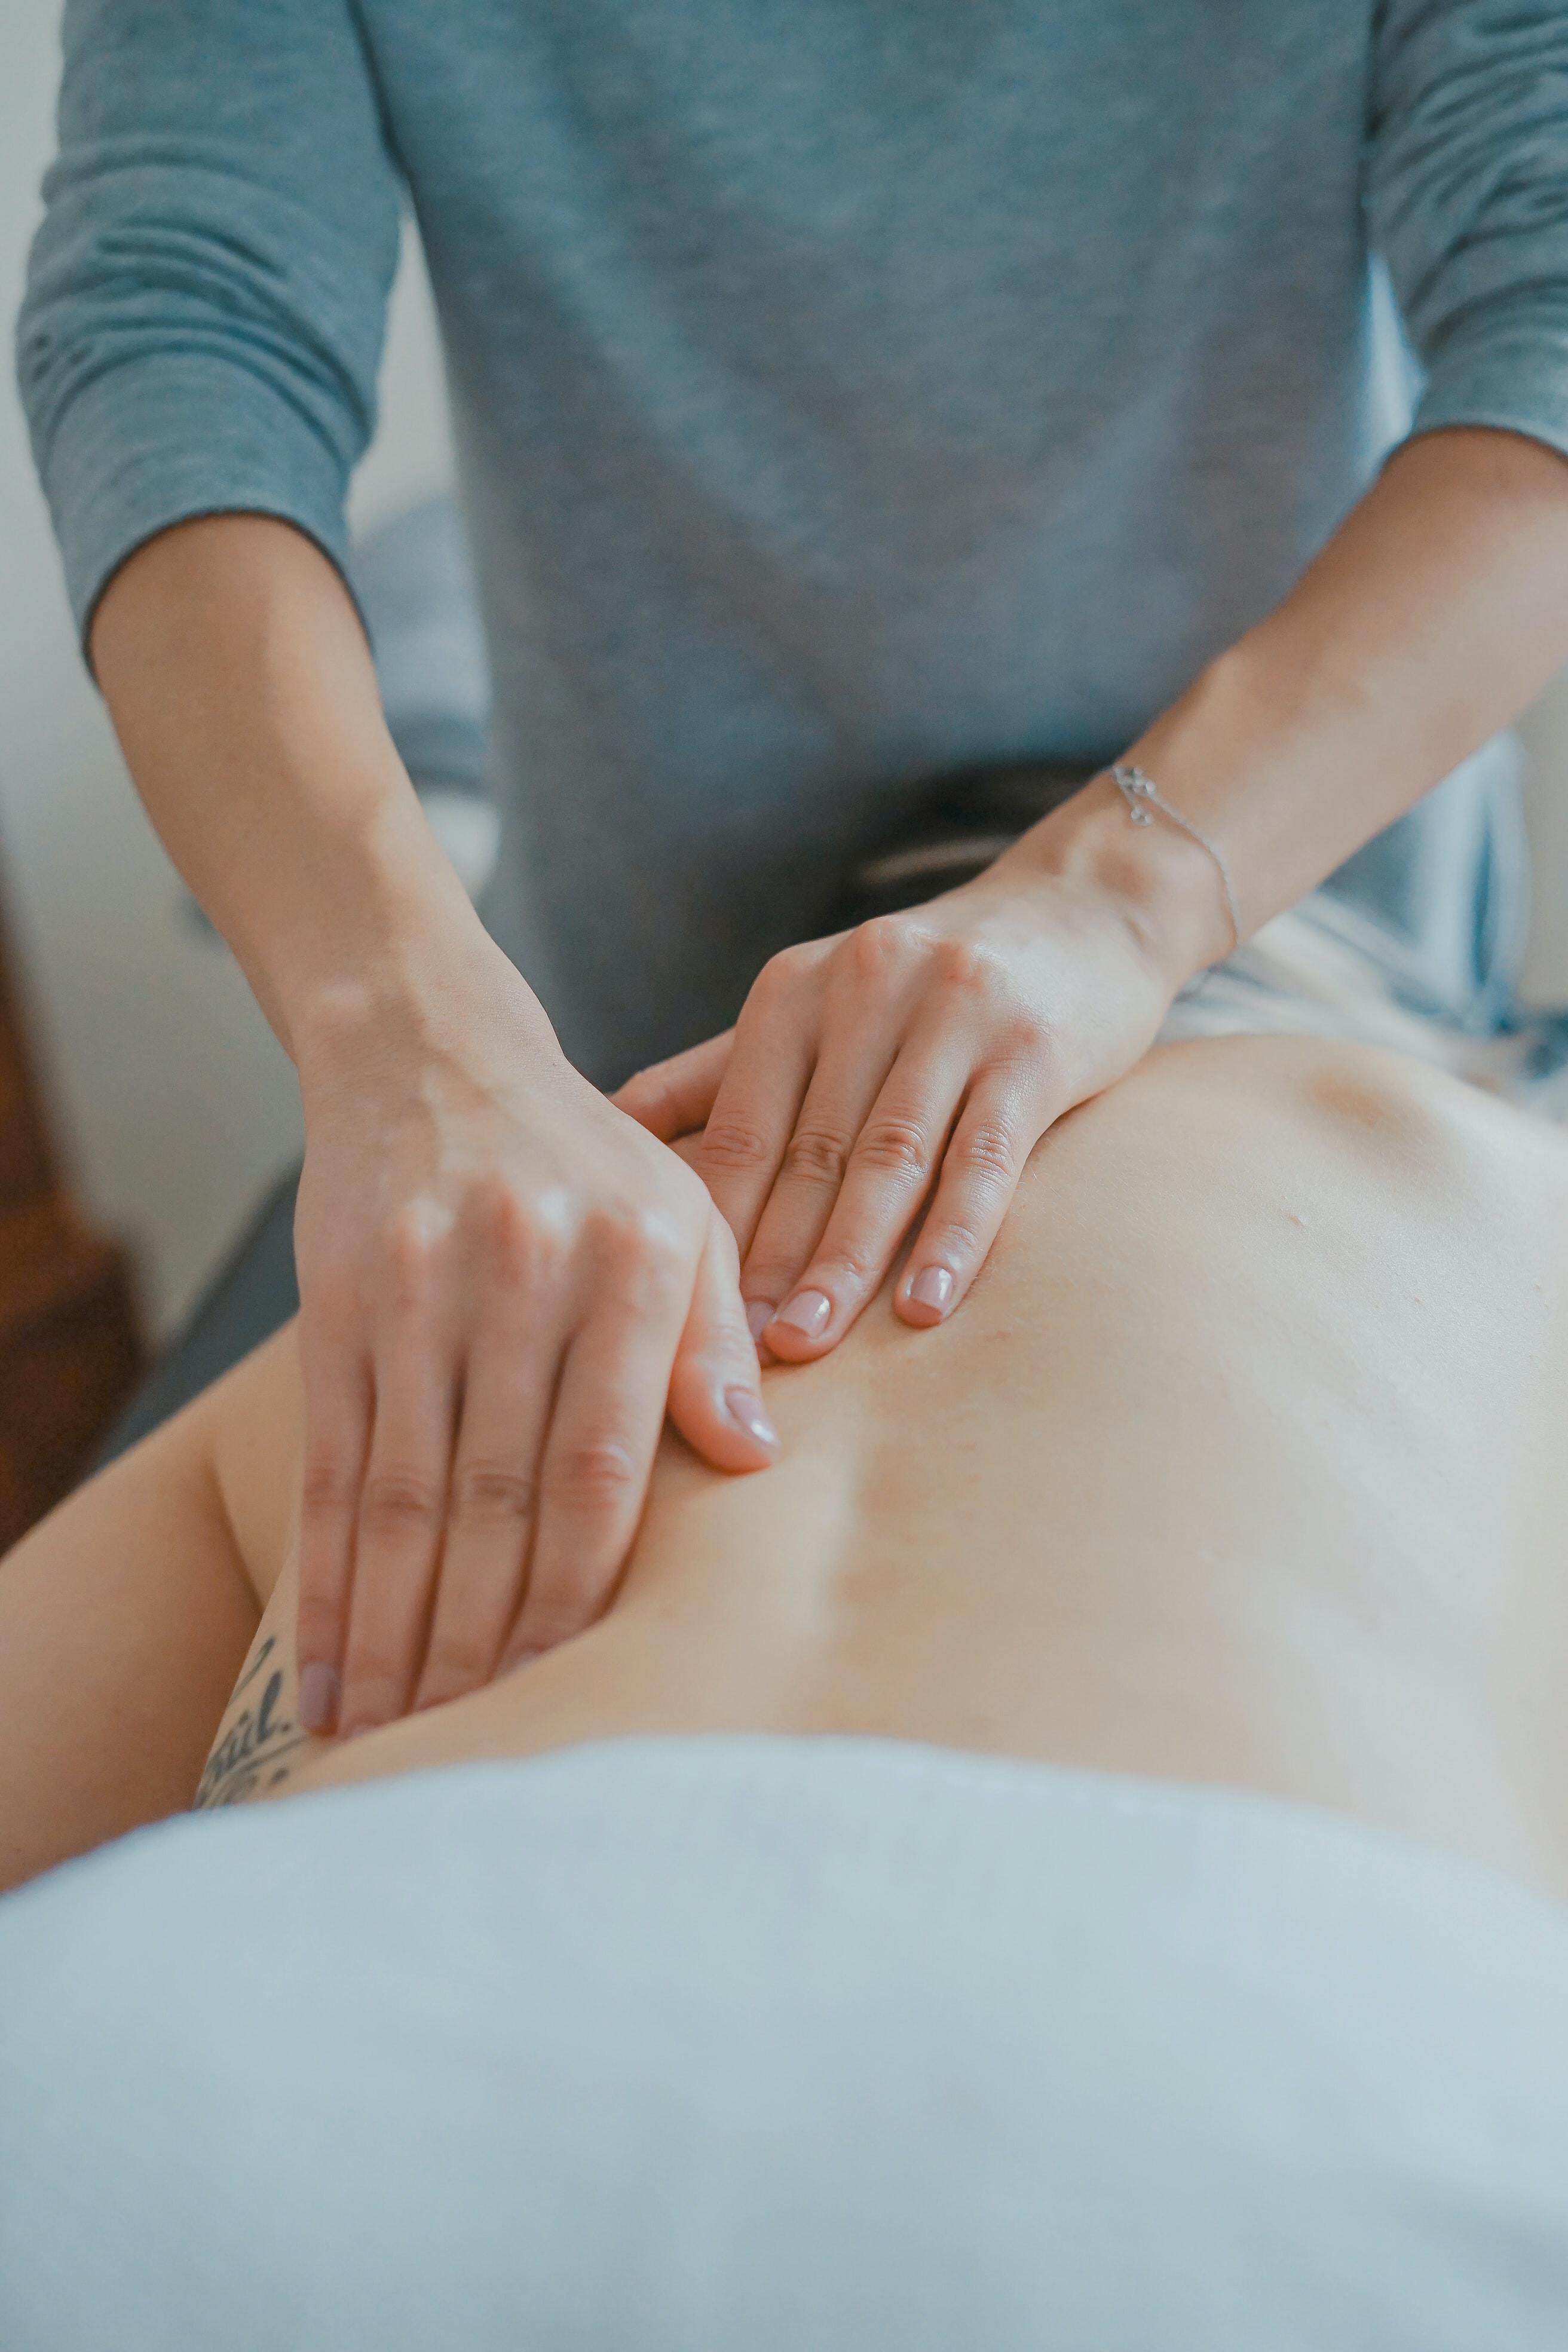 Afspraak relaxatie therapie